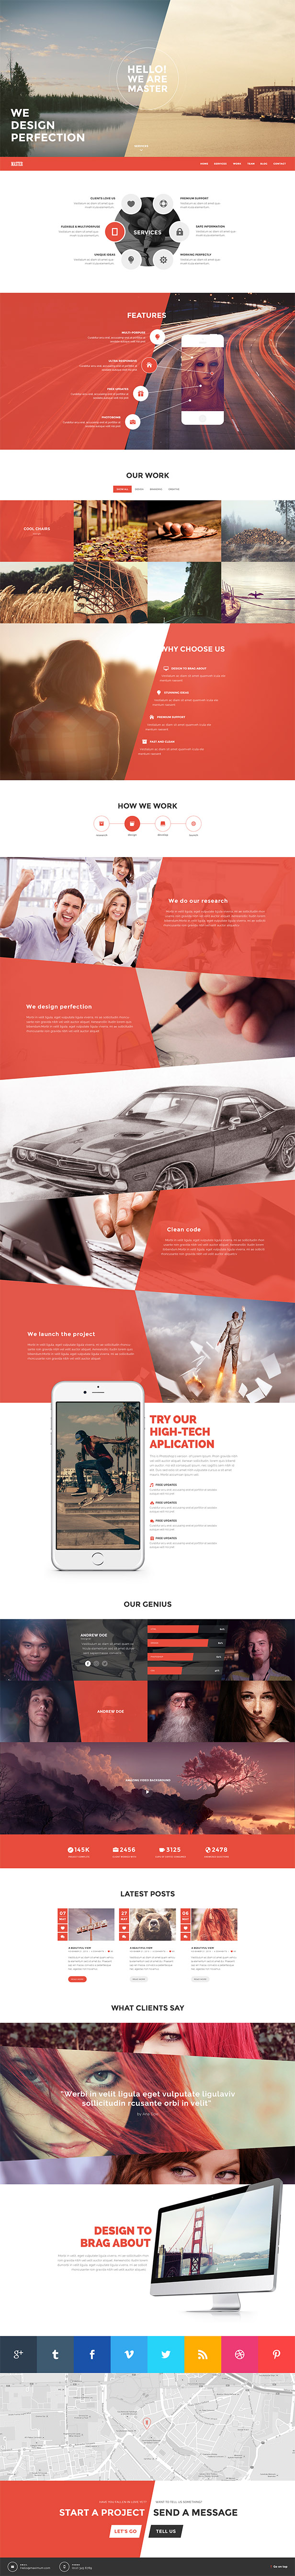 Plantilla One Page HTML